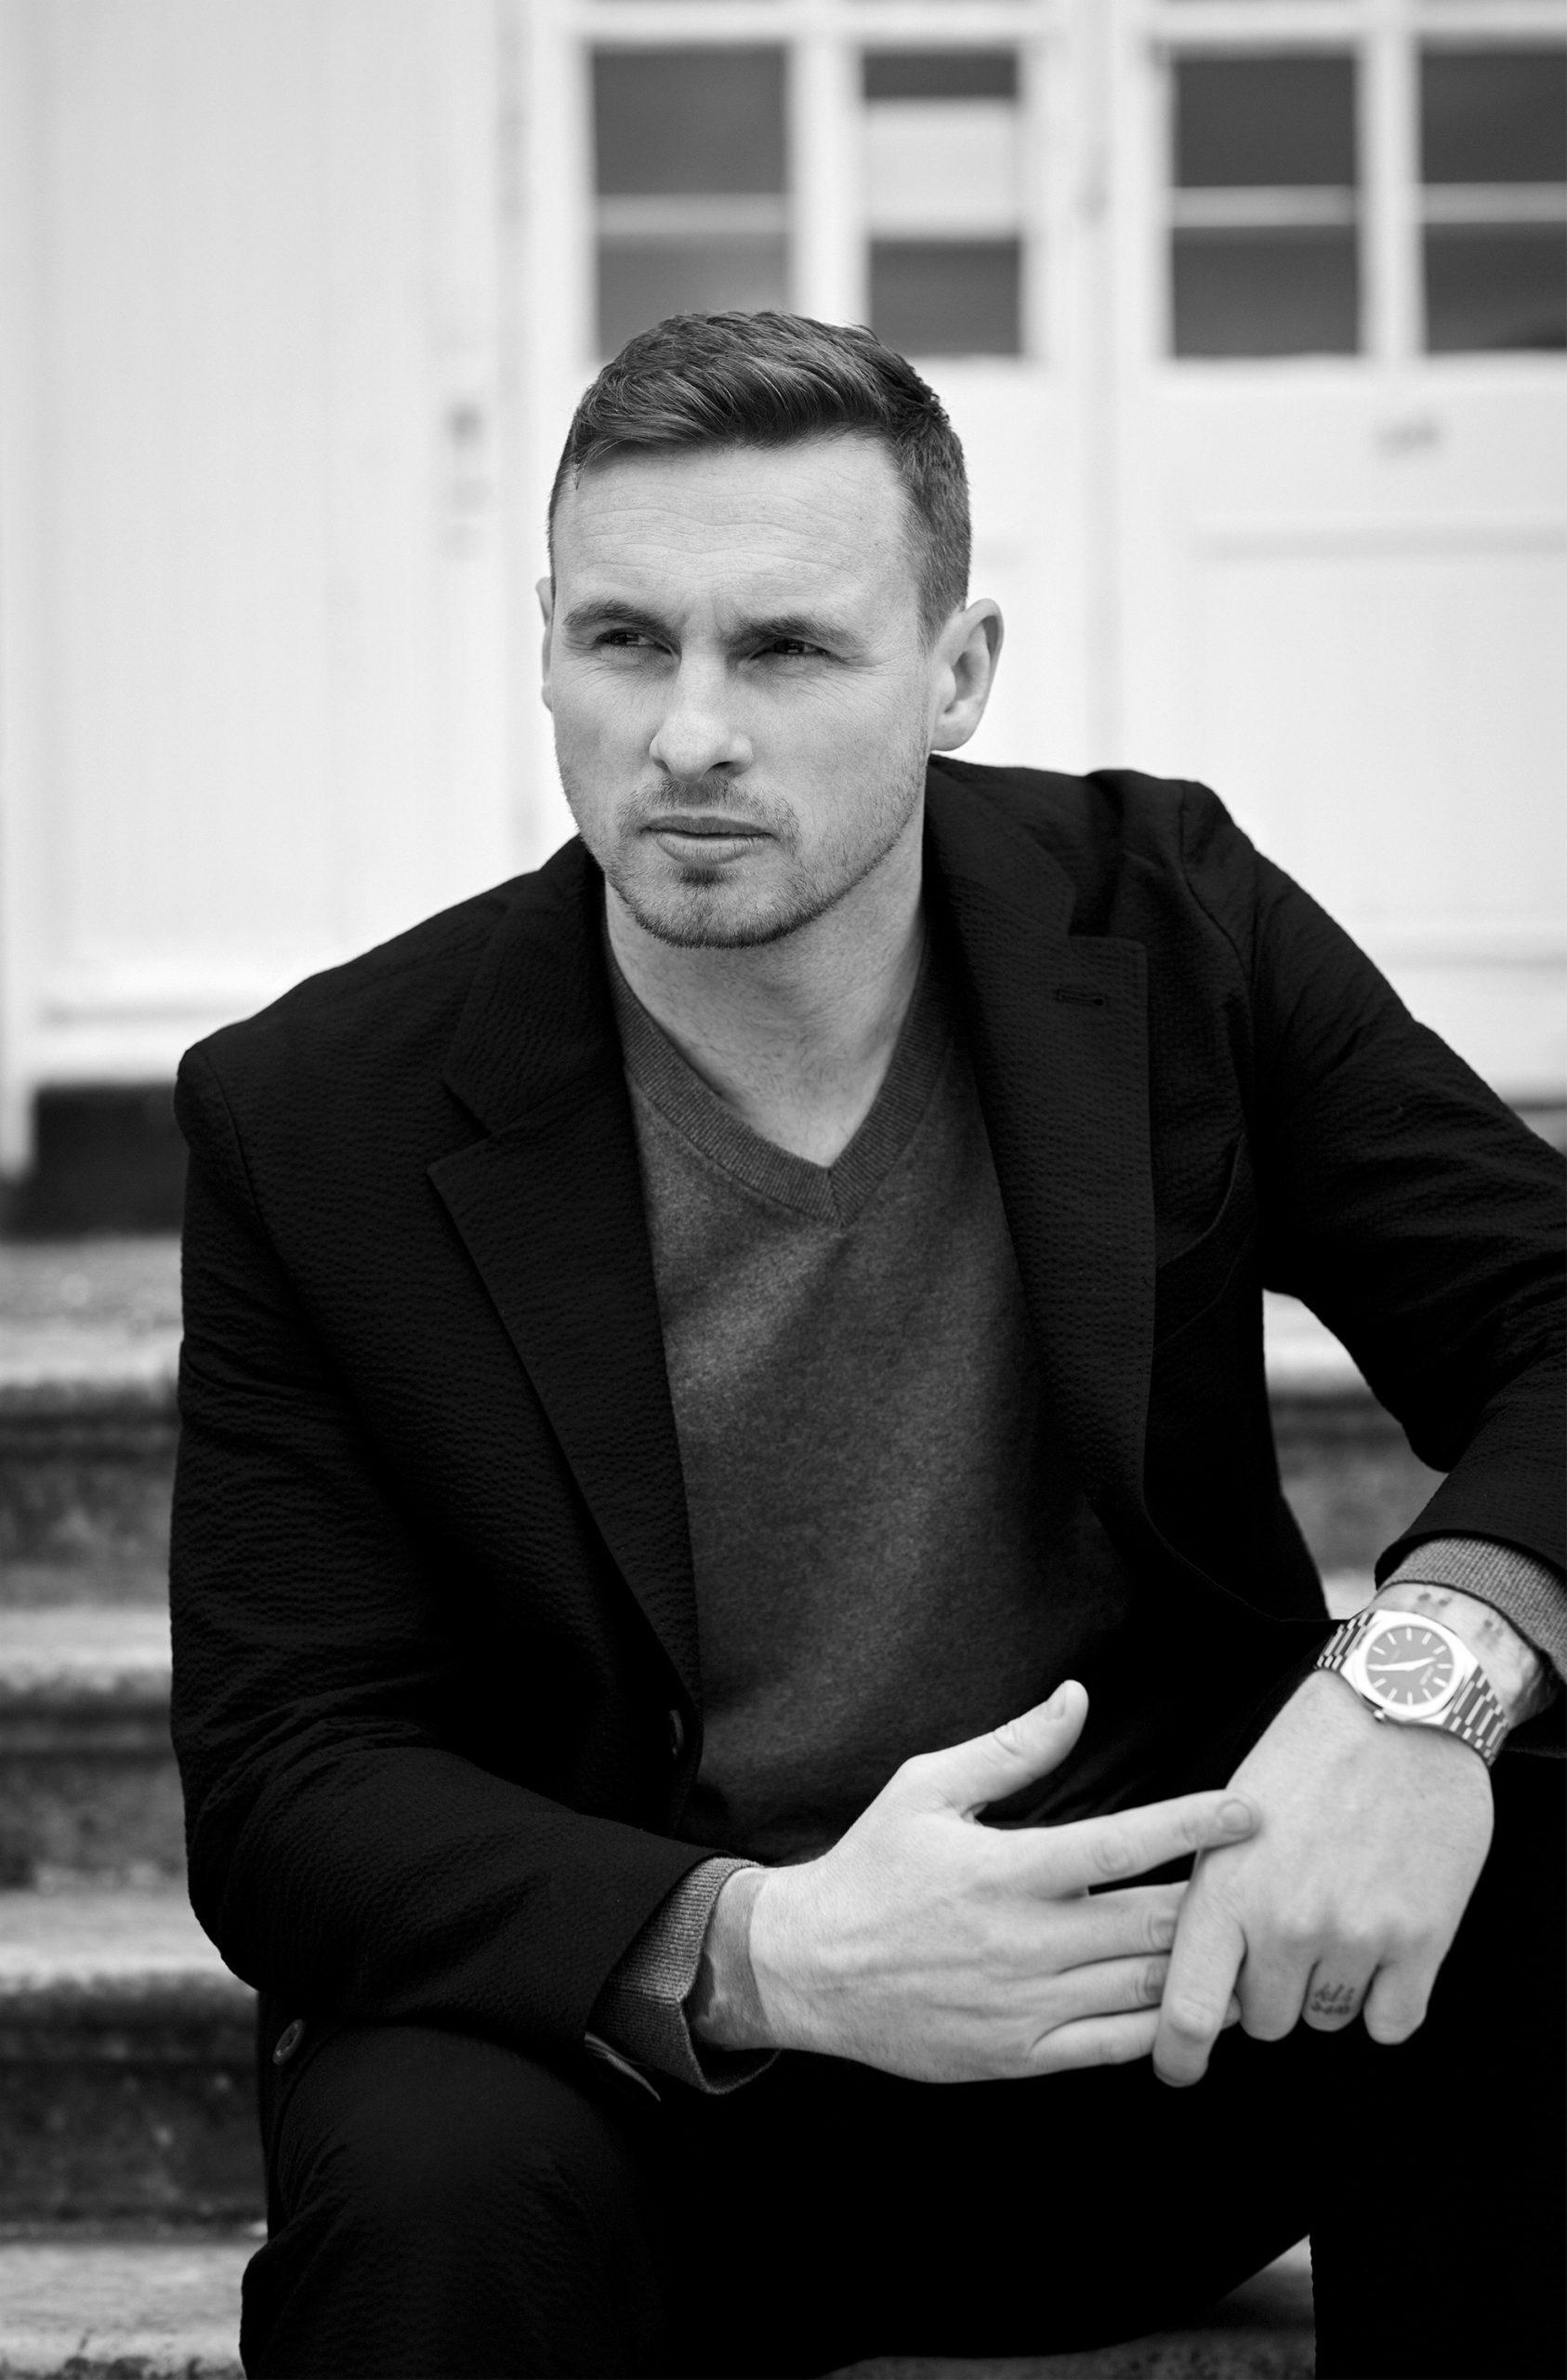 David Stockdale sitting on some steps outside wearing a blazer